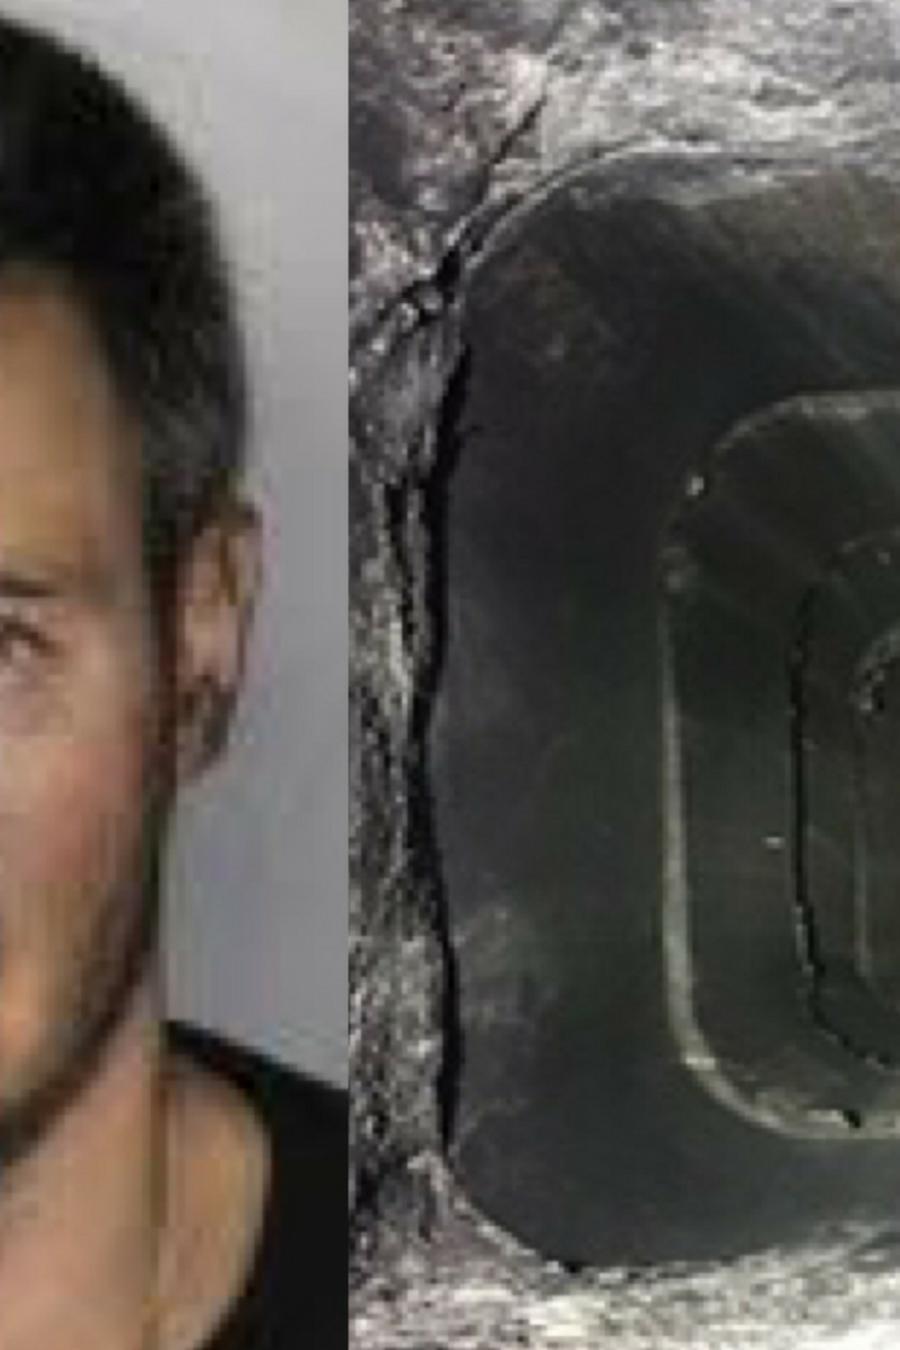 Un hombre que  intentó a entrar a un bar por la chimenea  para robarlo estaba atorado